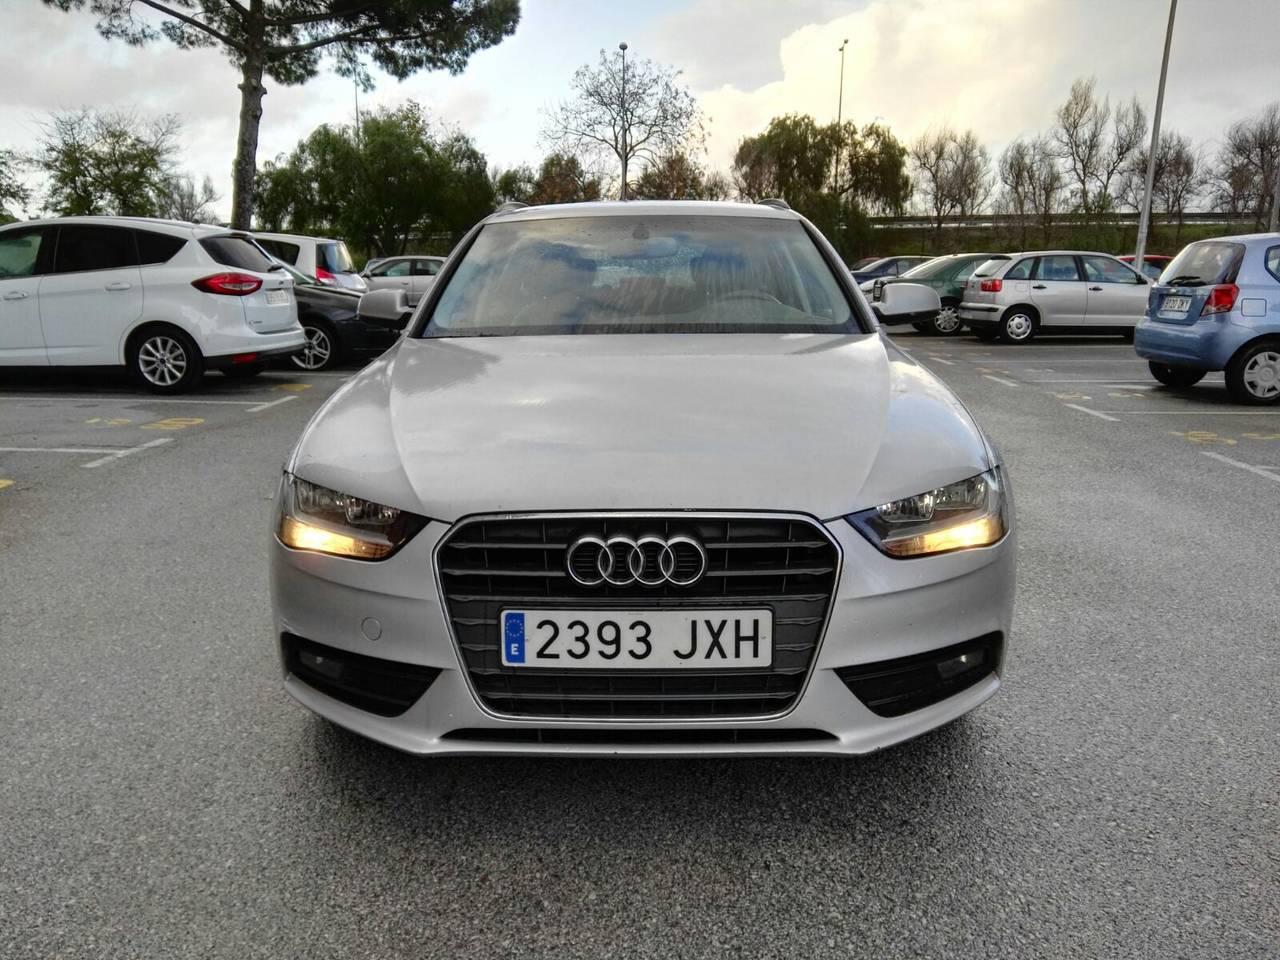 Audi A4 Avant 2.0 TDI 136cv...  - Foto 4